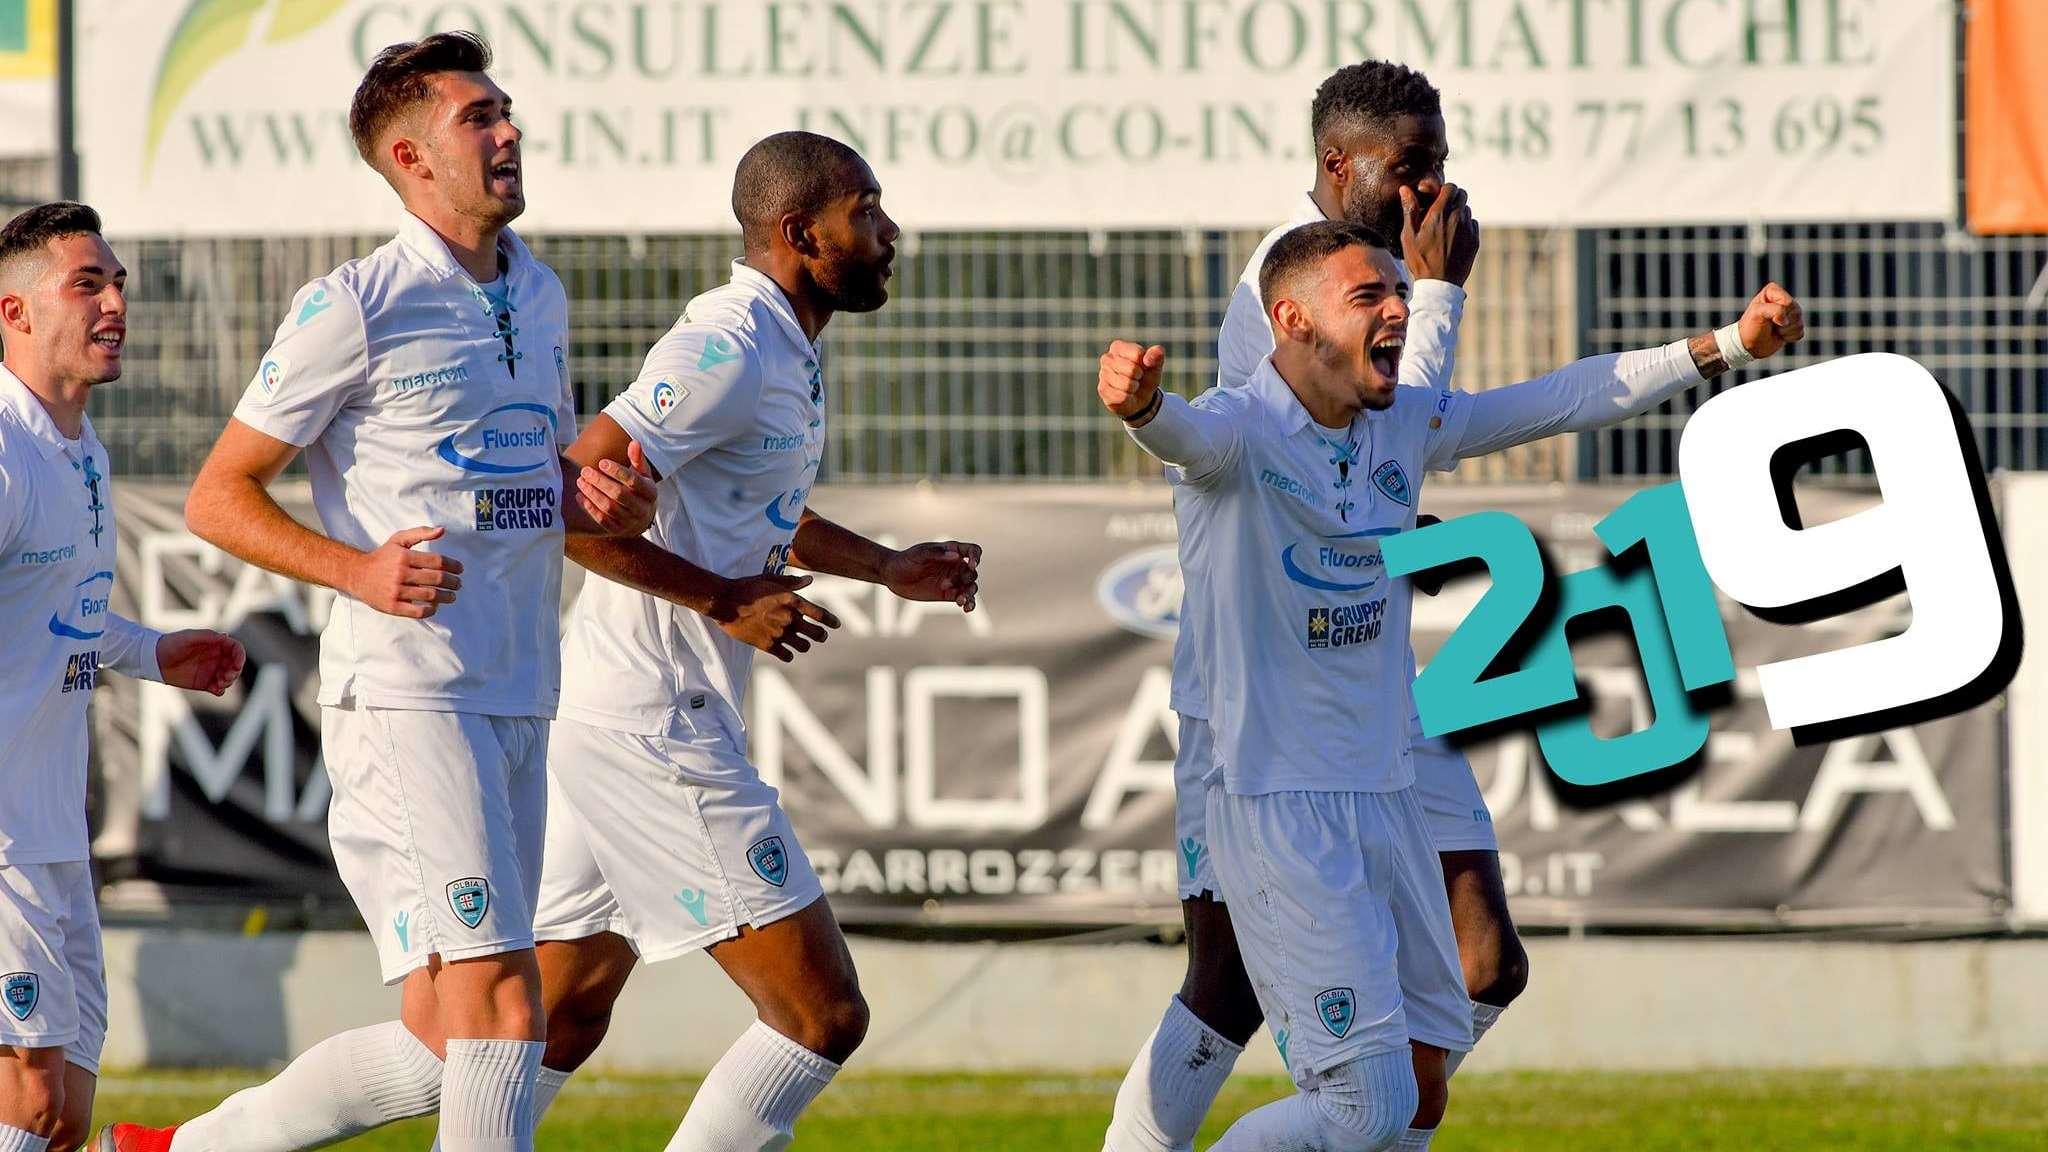 Serie C - Olbia